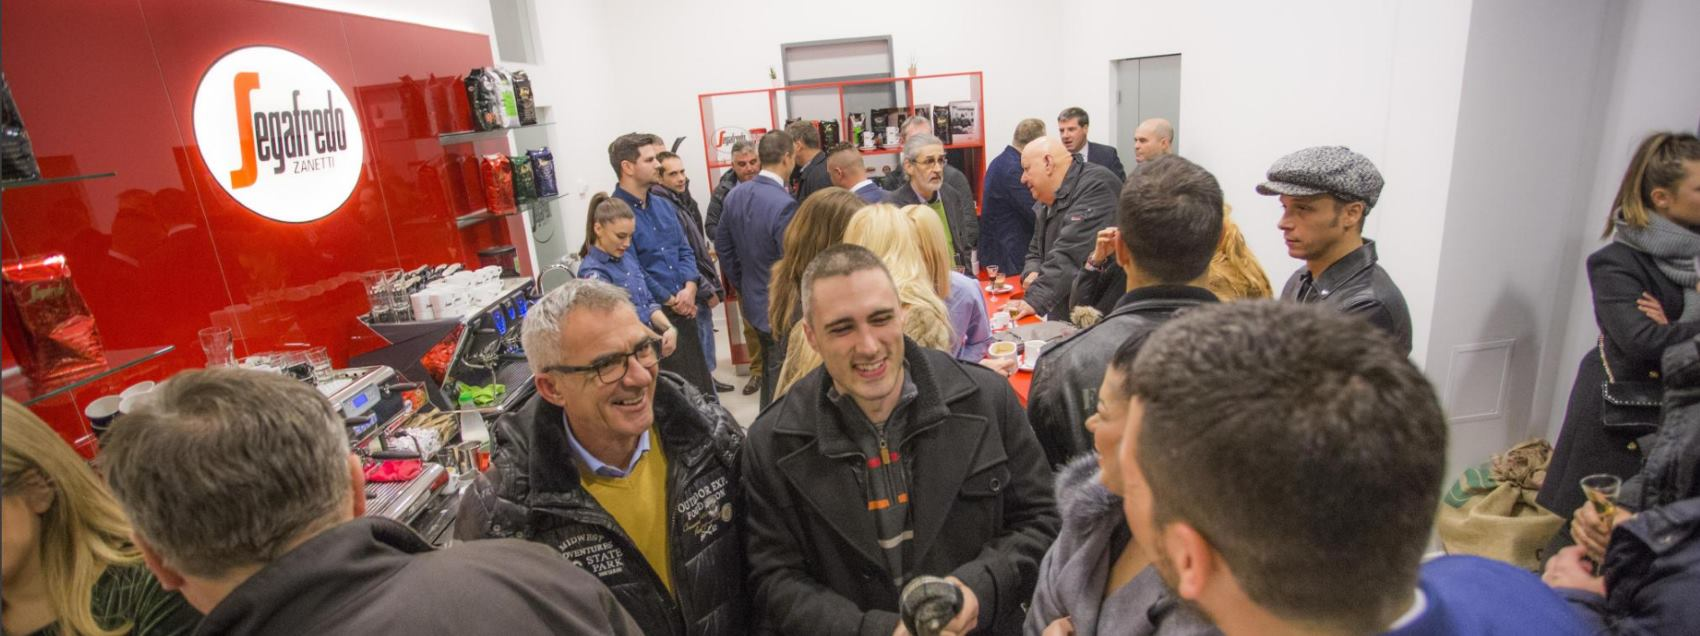 FOTO: Segafredo Zanetti otvorio novi edukacijski centar i ured